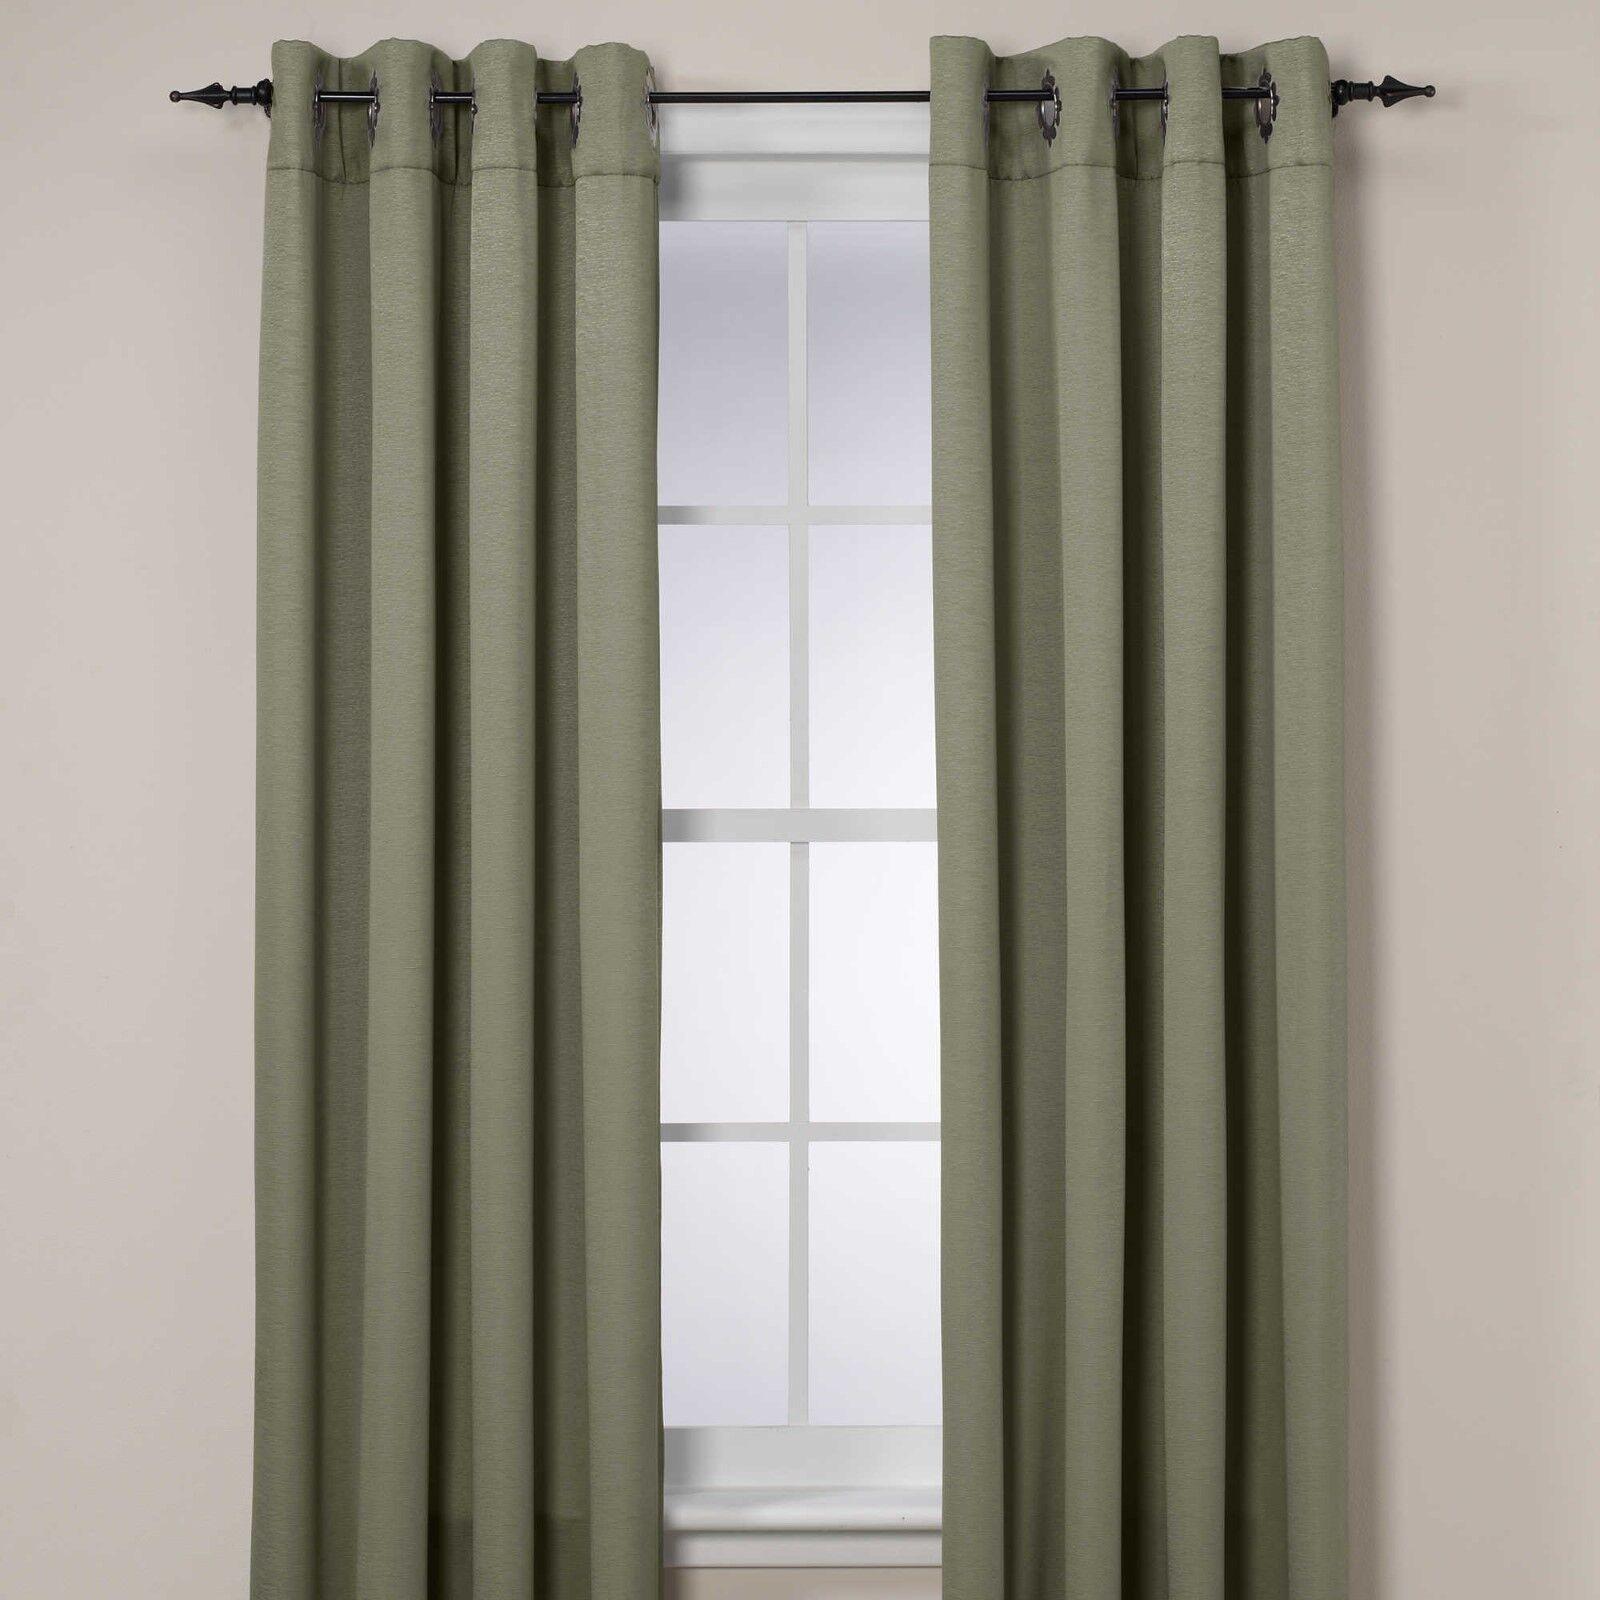 Insola Odyssey Odyssey Odyssey 108-Inch Insulating Window Curtain Panel in Seagrass 34a80b